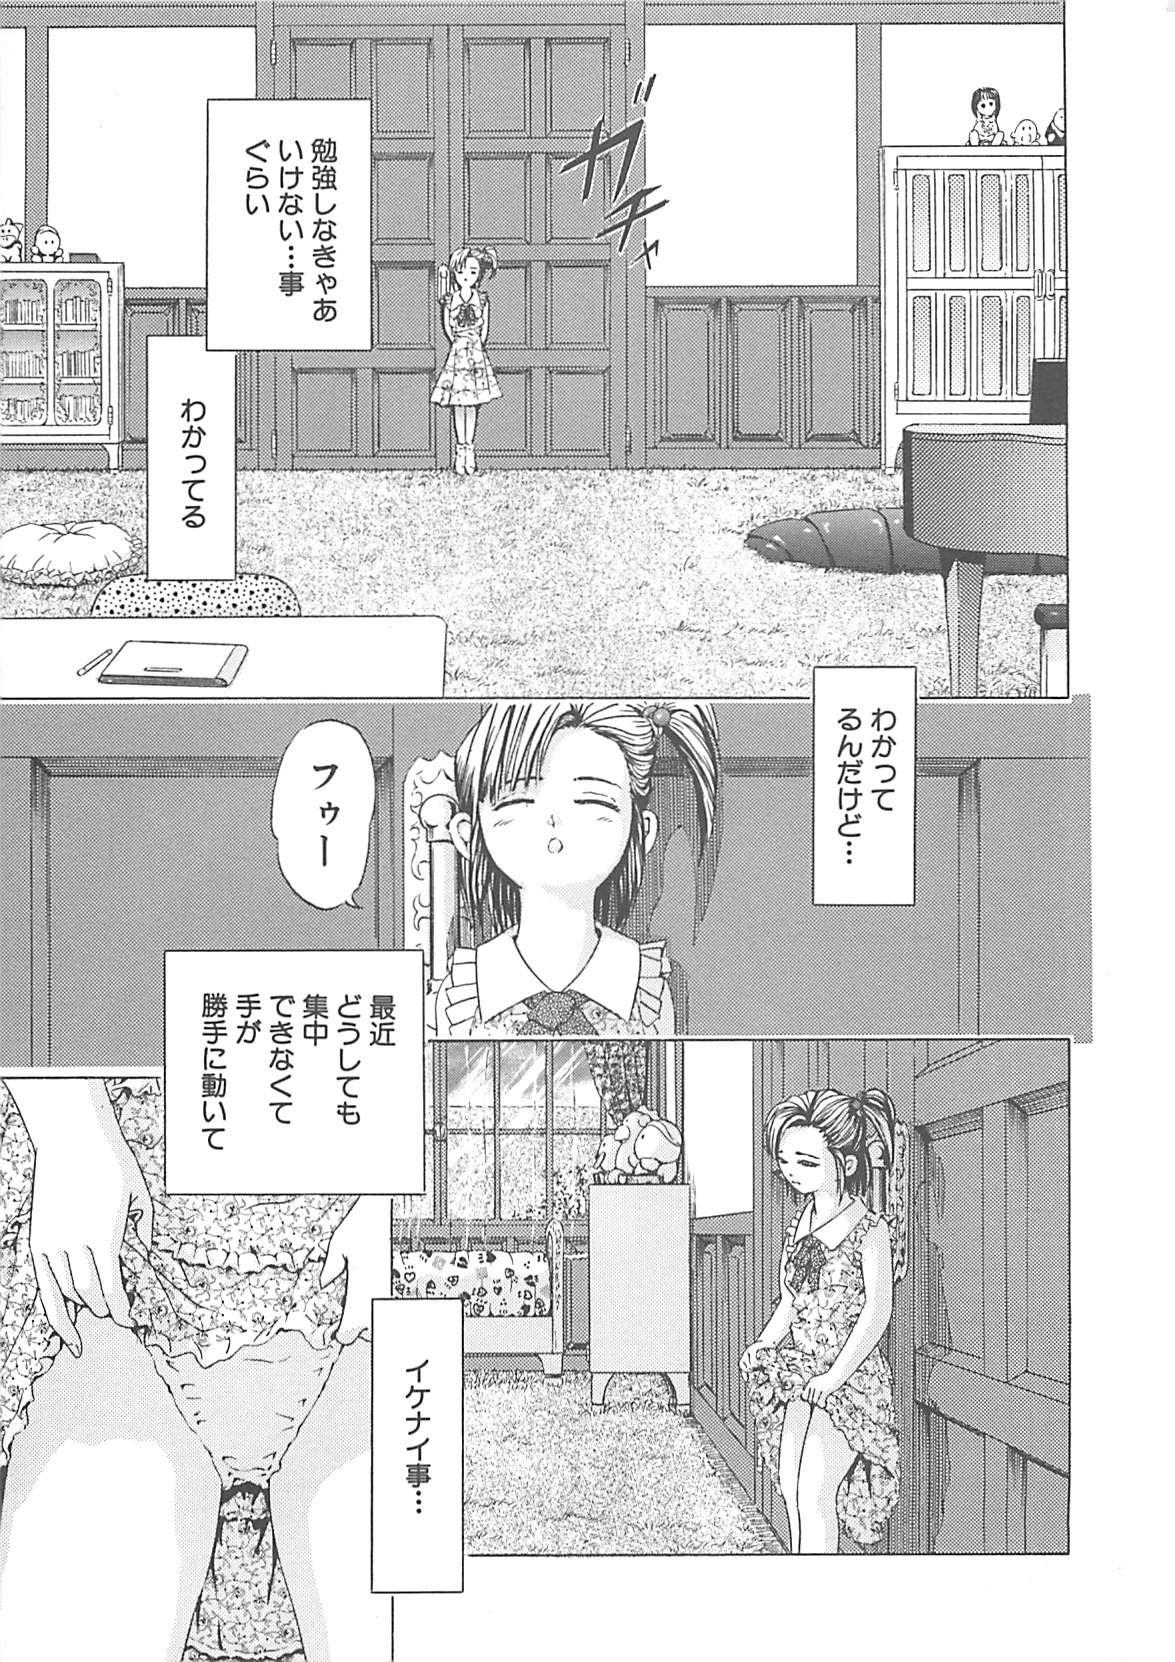 Kanin Kyoushitsu - Adultery Classroom 53